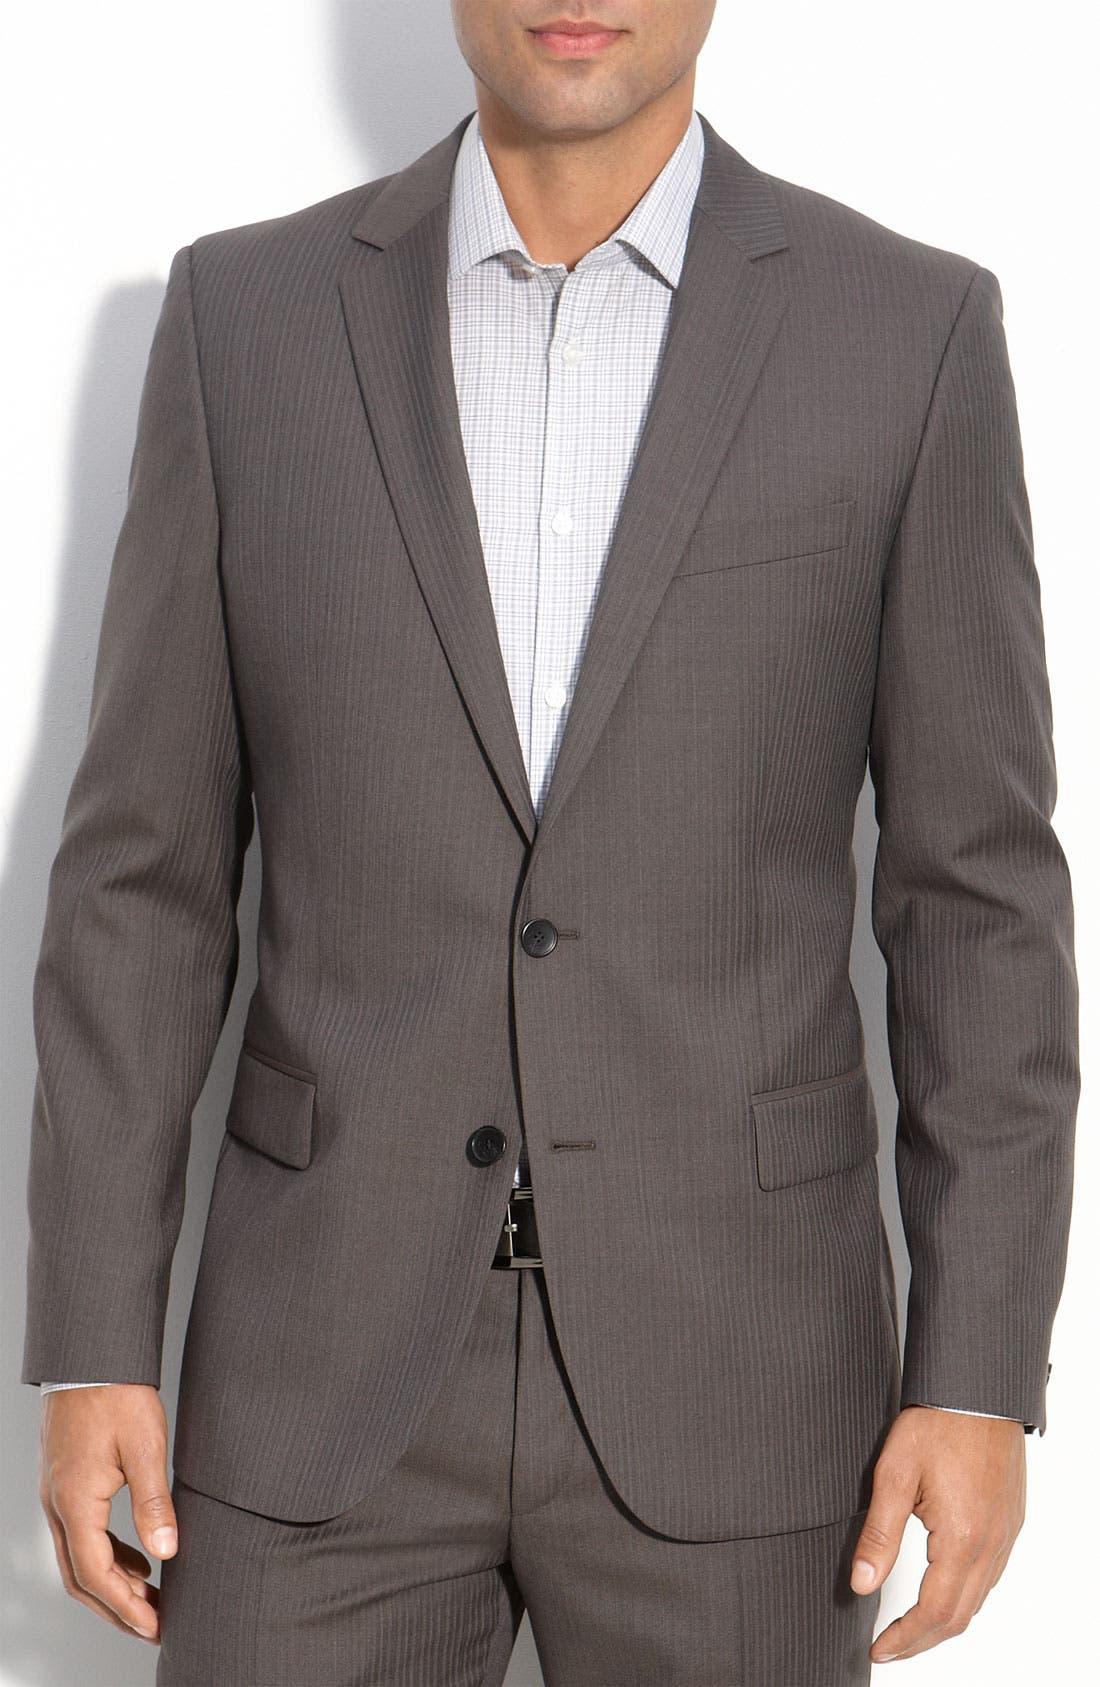 ZZDNUHUGO BOSS,                             HUGO 'Amaro/Heise' Grey Shadow Stripe Wool Suit,                             Main thumbnail 1, color,                             030